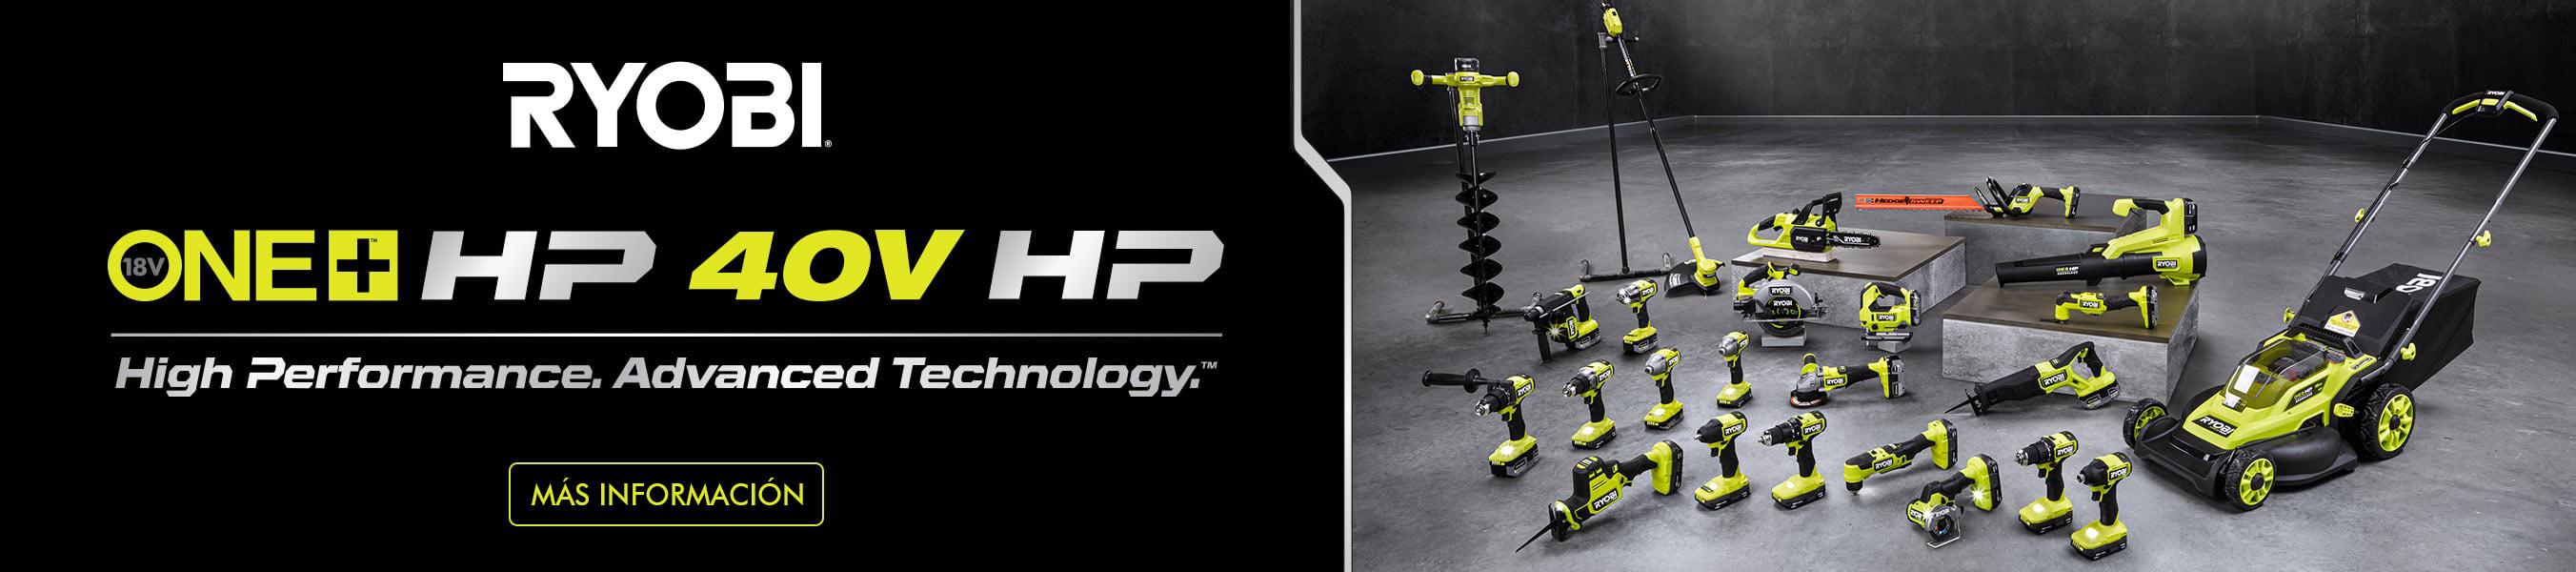 RYOBI ONE+ HP: High Performance. Advanced Technology.